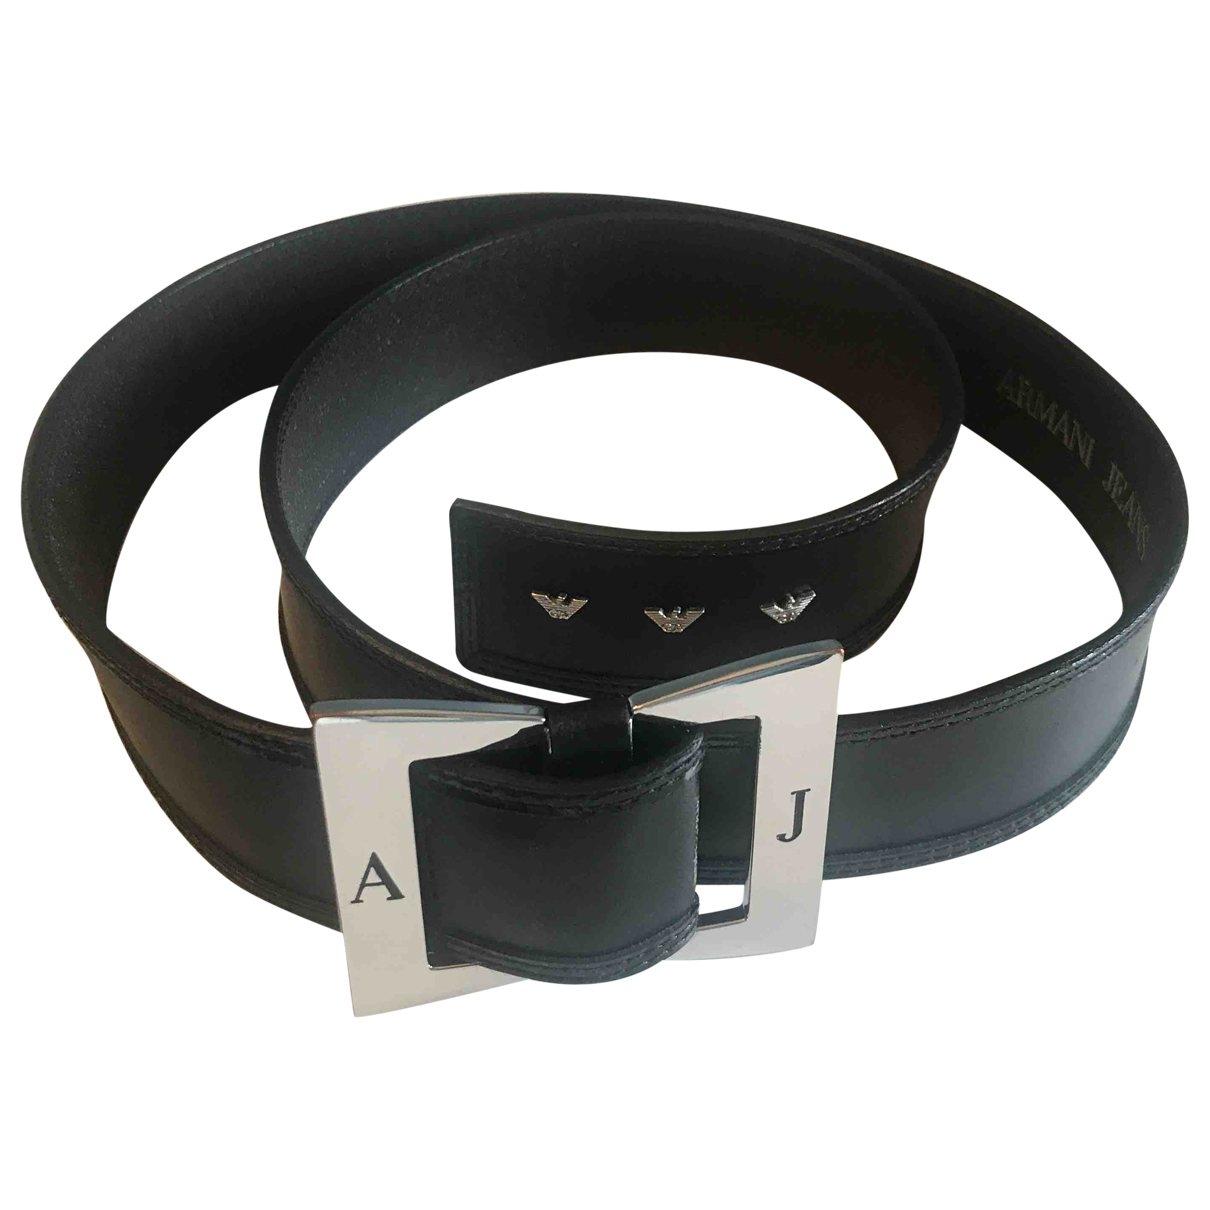 Armani Jeans \N Black Leather belt for Women S International